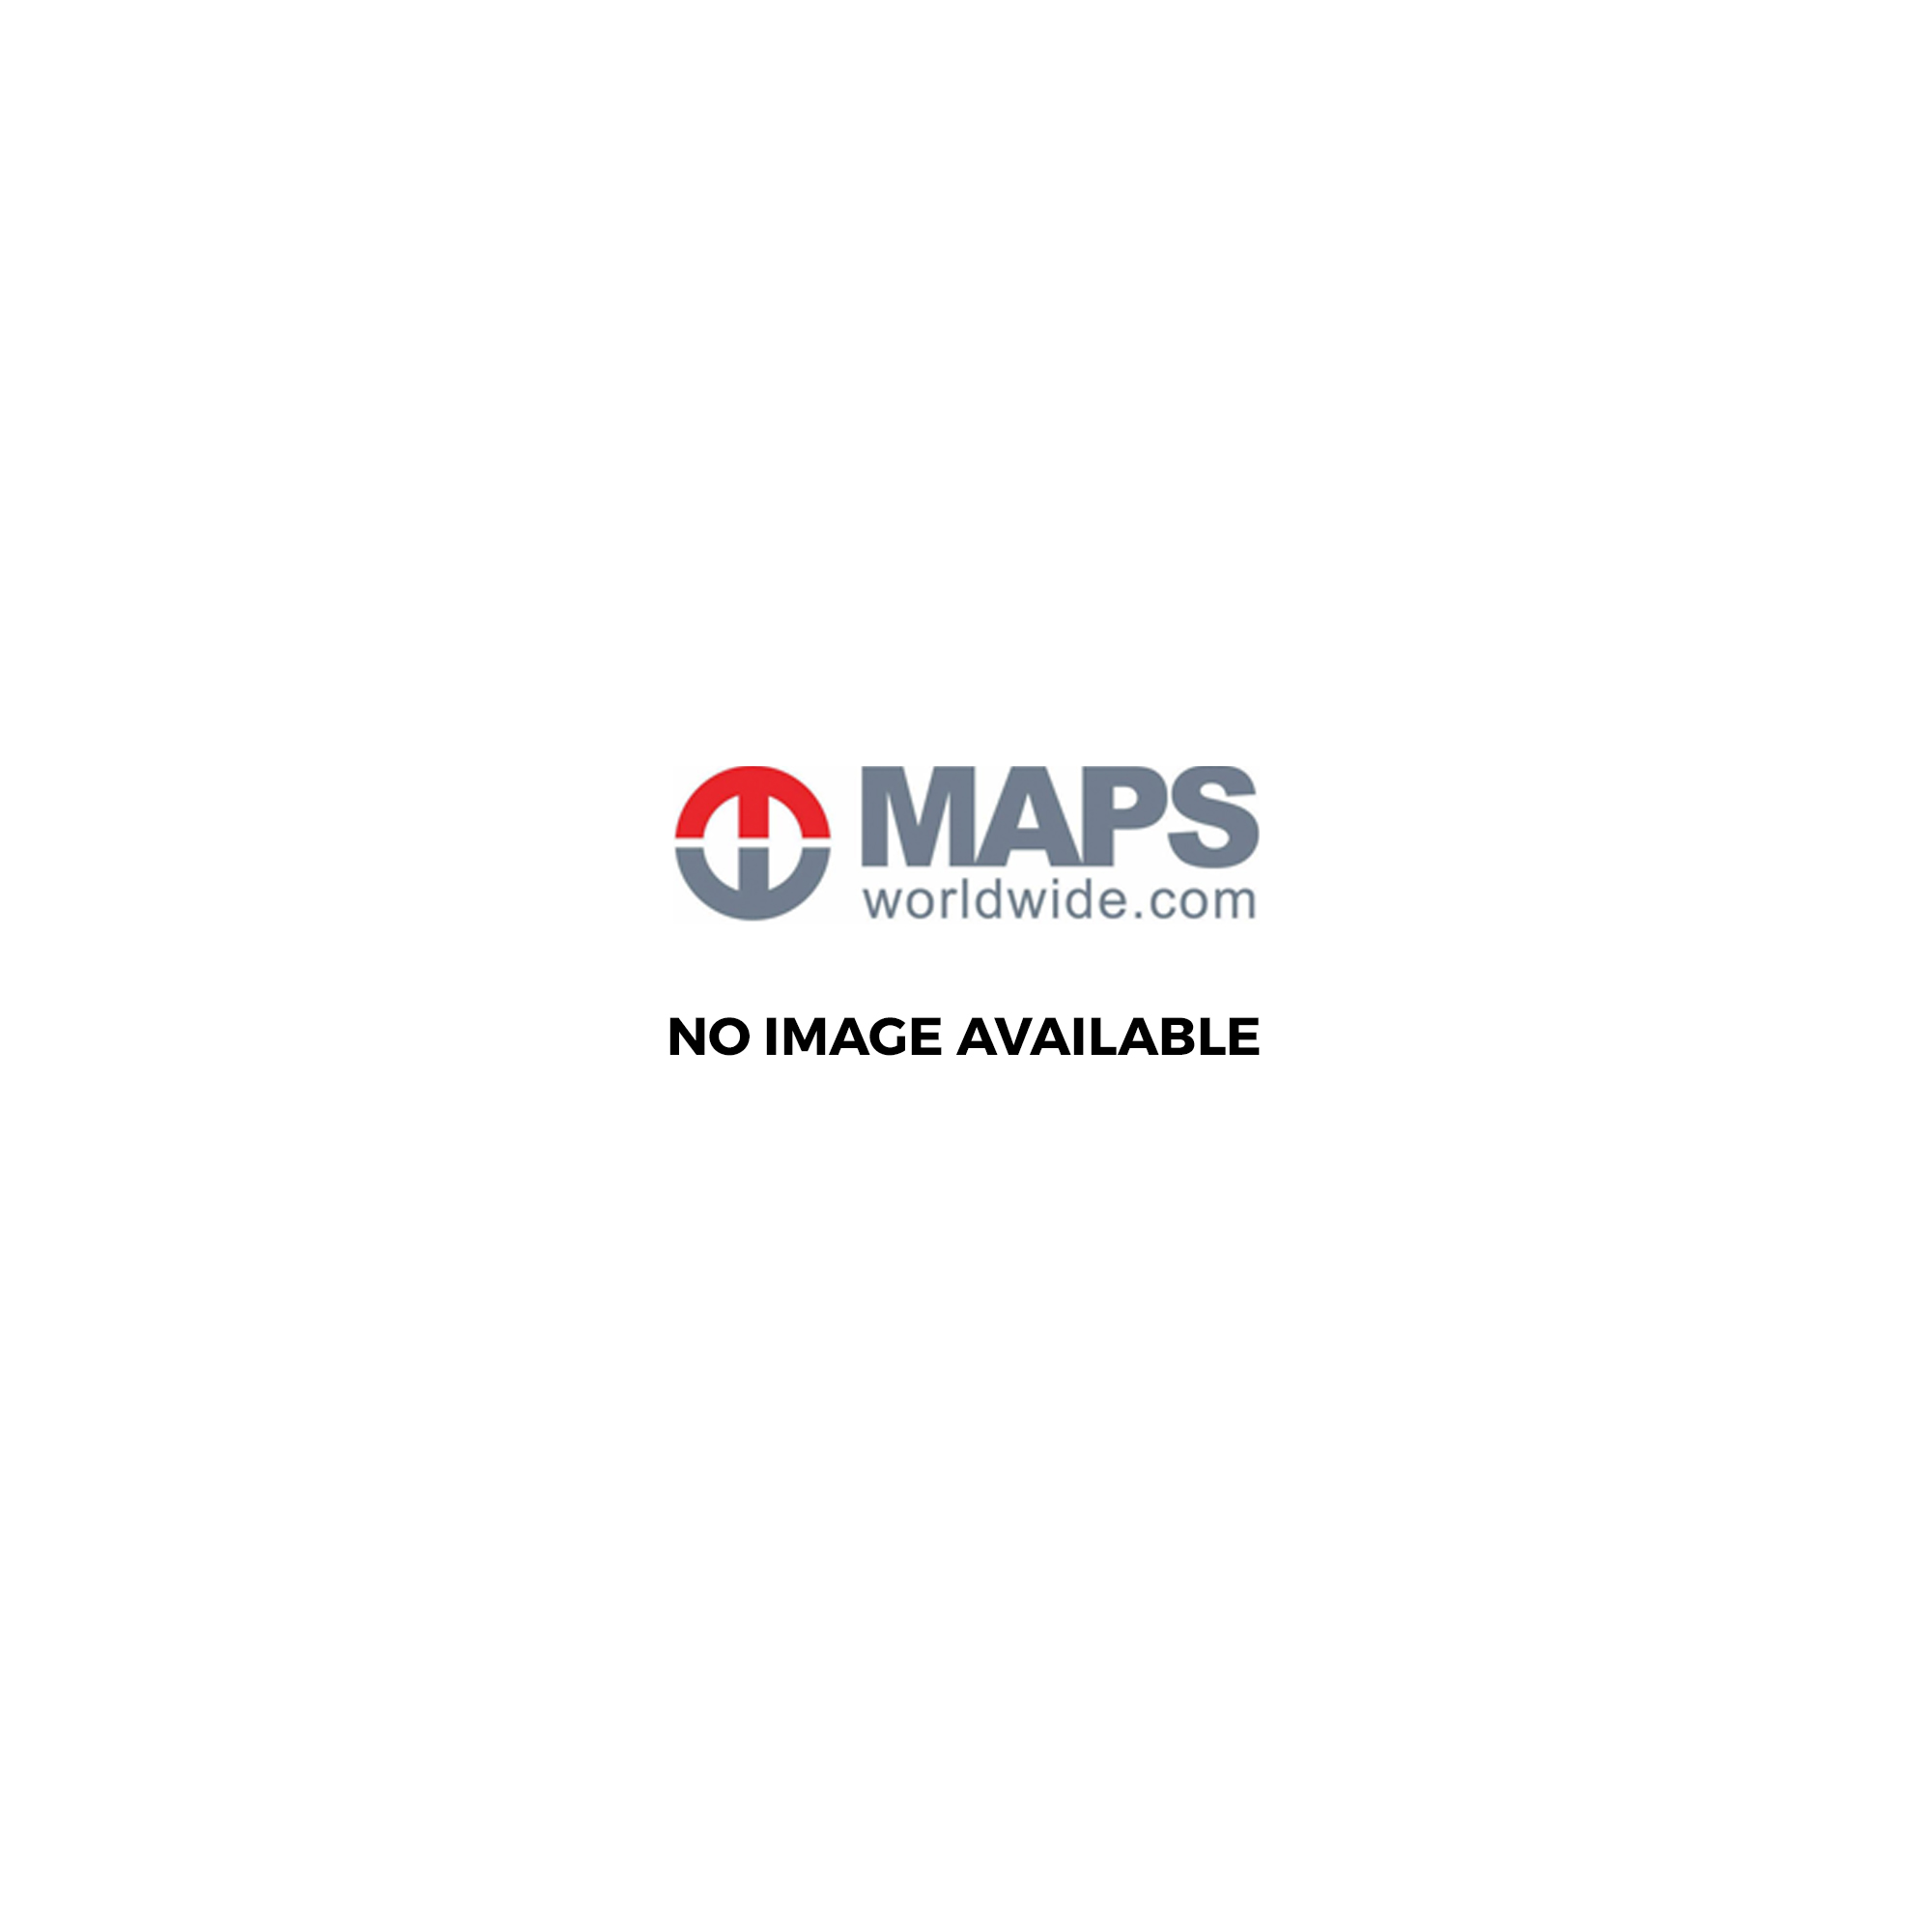 OyerLillehammer Tourist Map 2495 Europe from Maps Worldwide UK